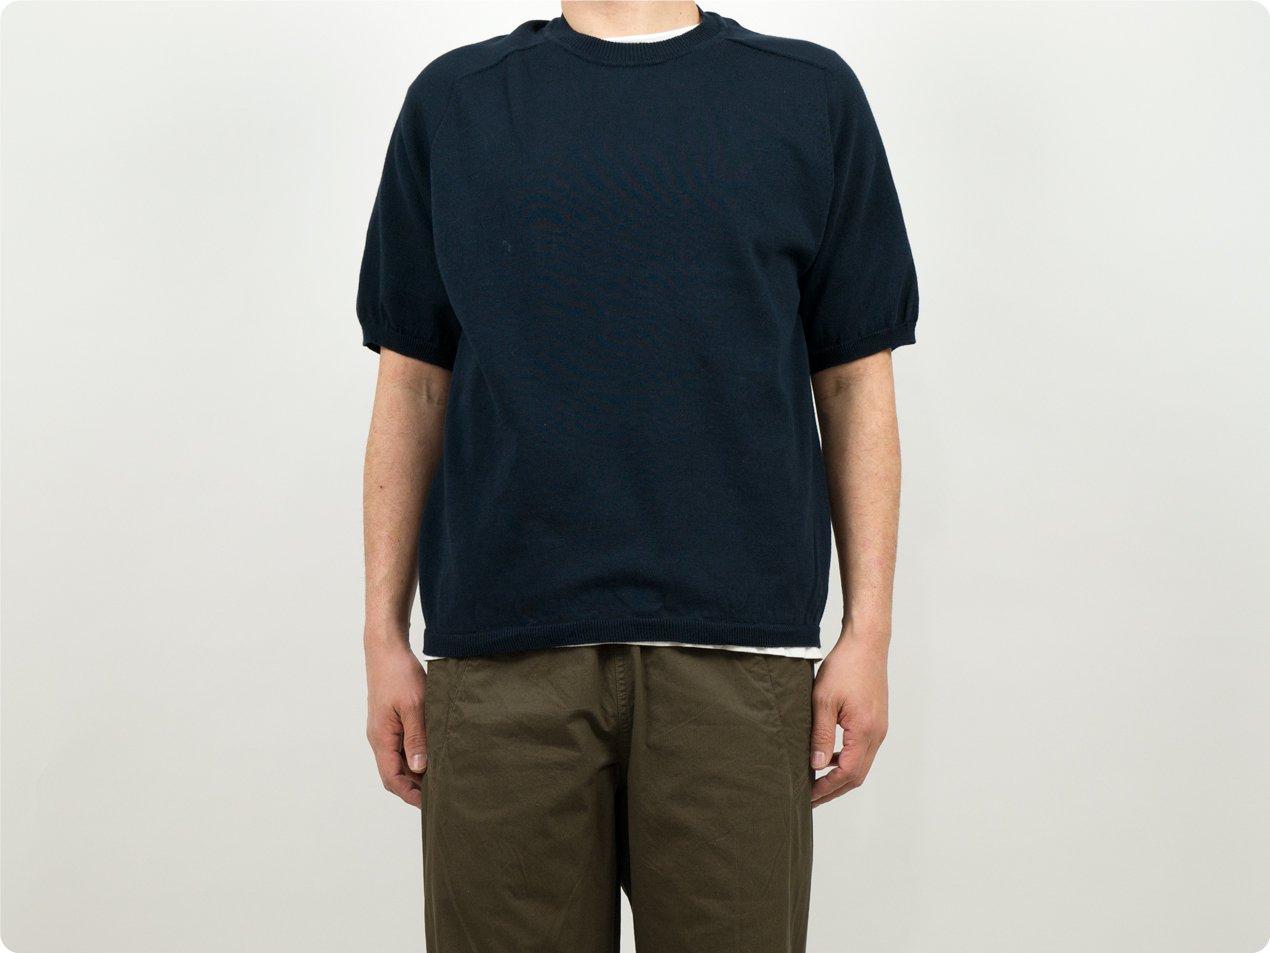 Charpentier de Vaisseau Klim Cotton Knit Short Sleeve NAVY